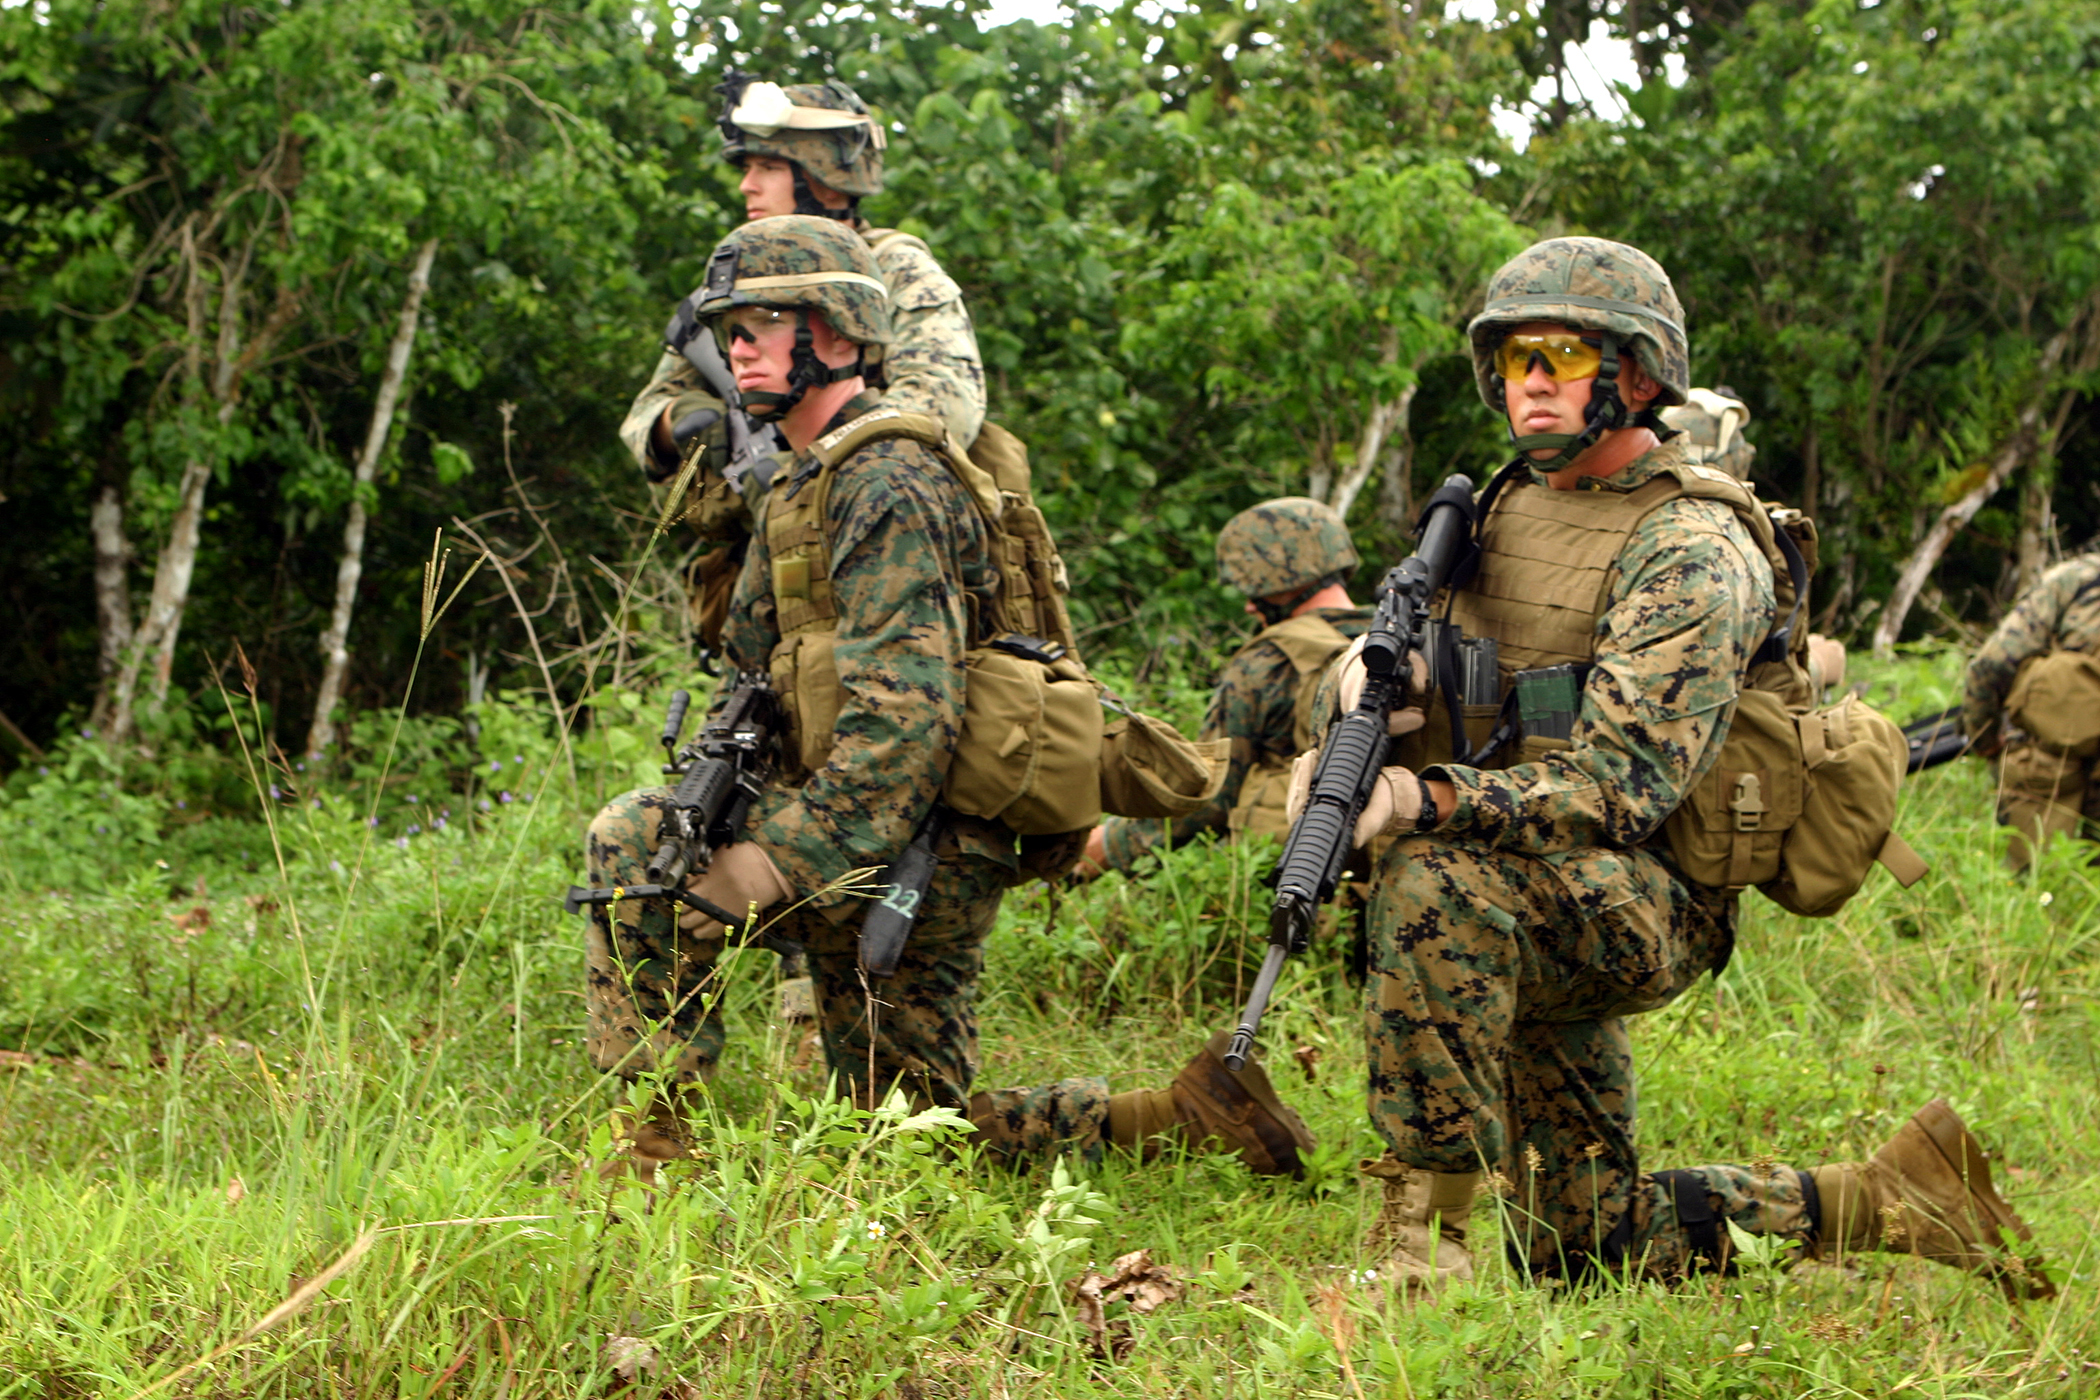 File:Marines MARPAT.JPG - Wikipedia, the free encyclopedia